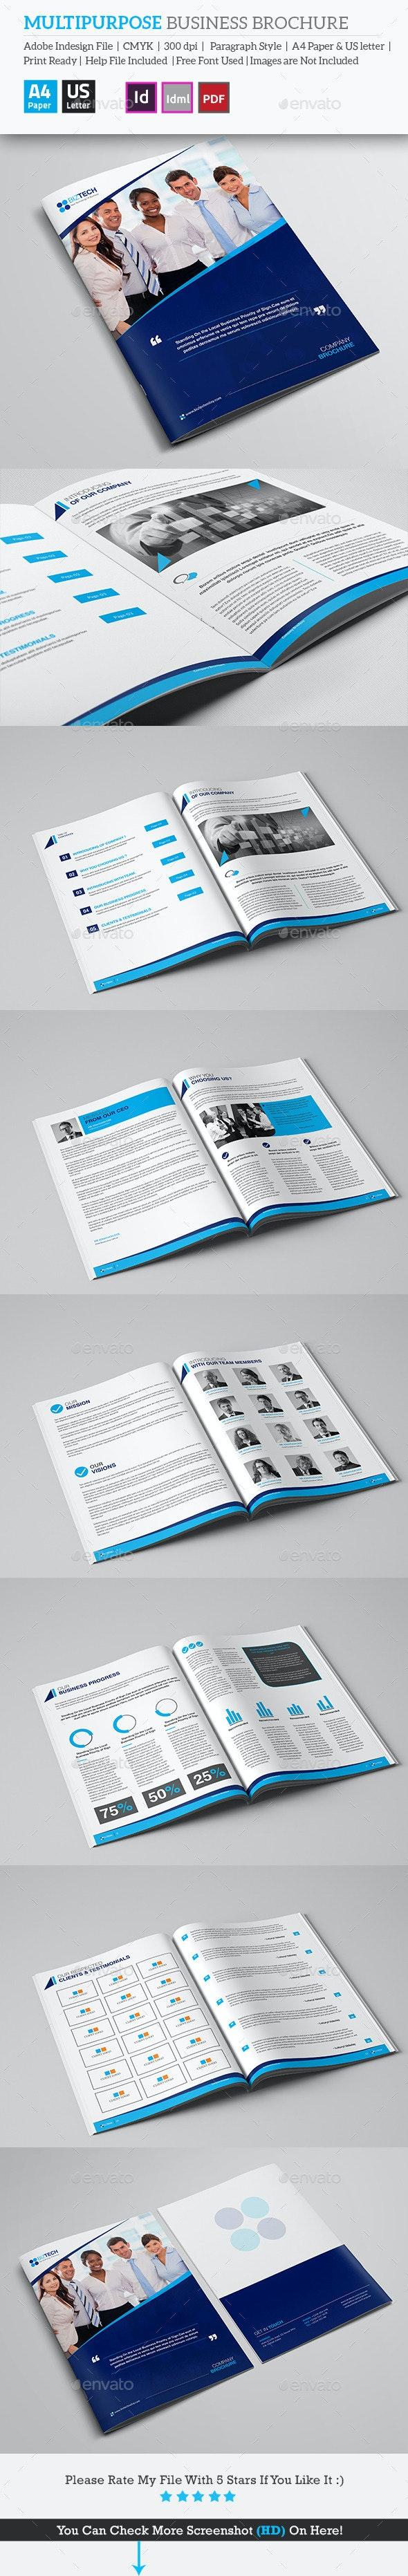 Multipurpose Business Brochure - Brochures Print Templates